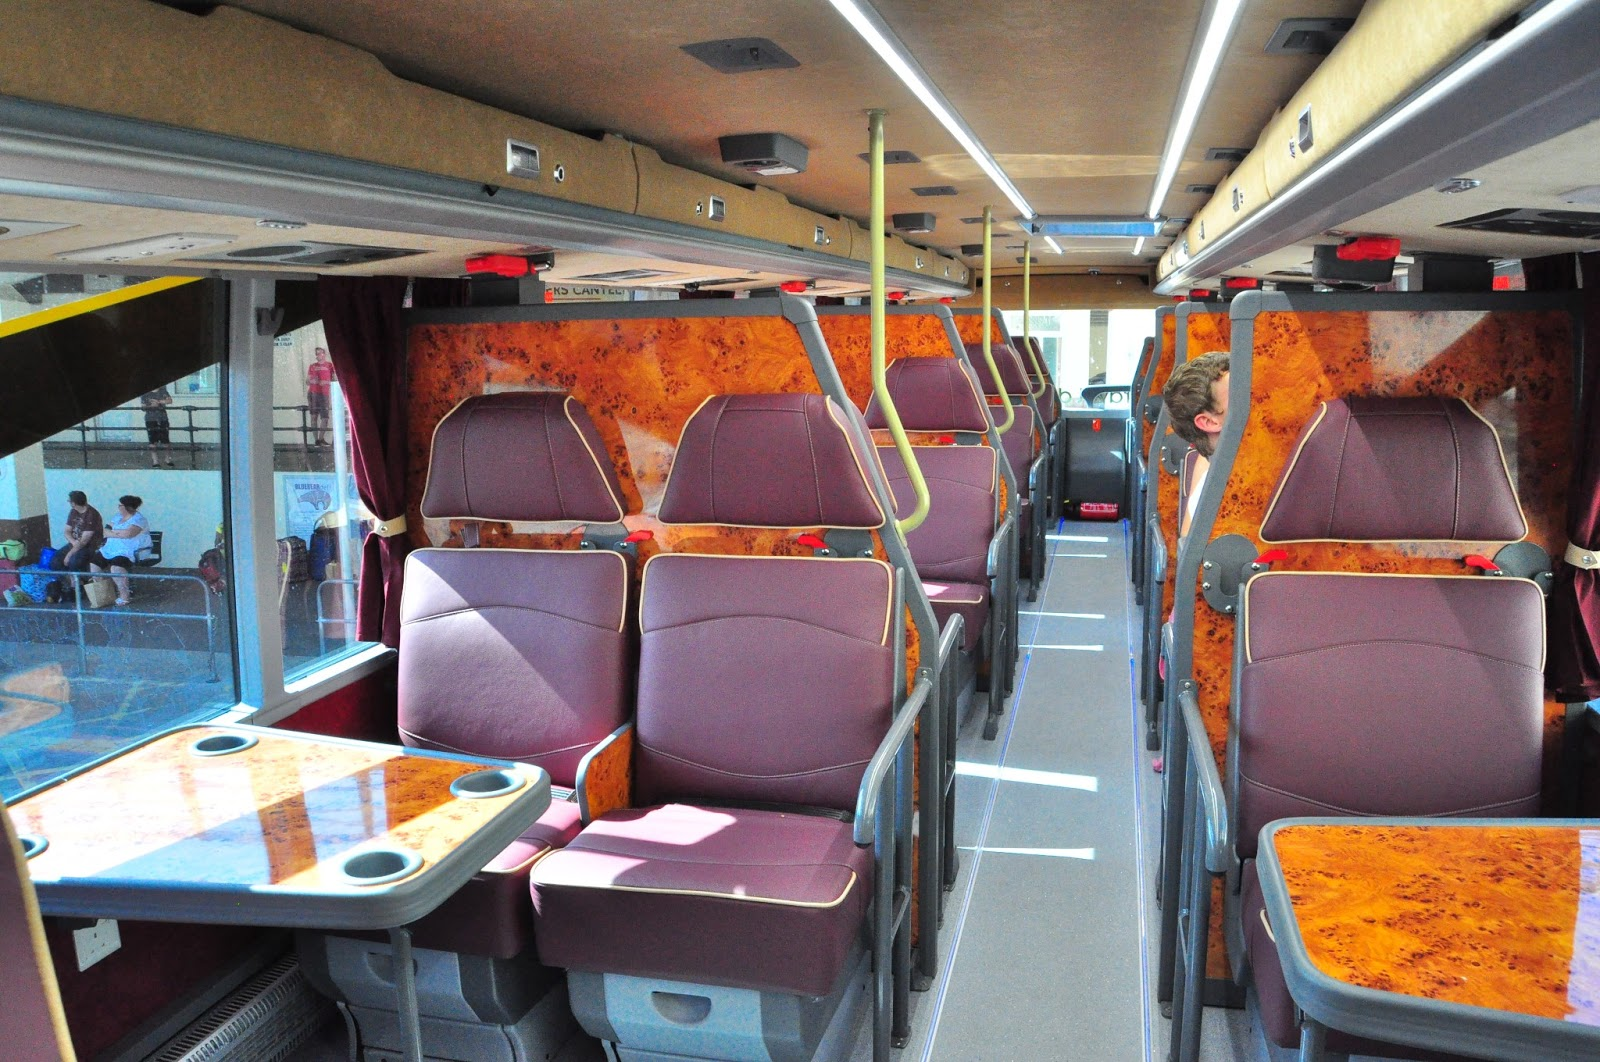 Public Transport Of The Plymouth Area: A mega Megabus ...